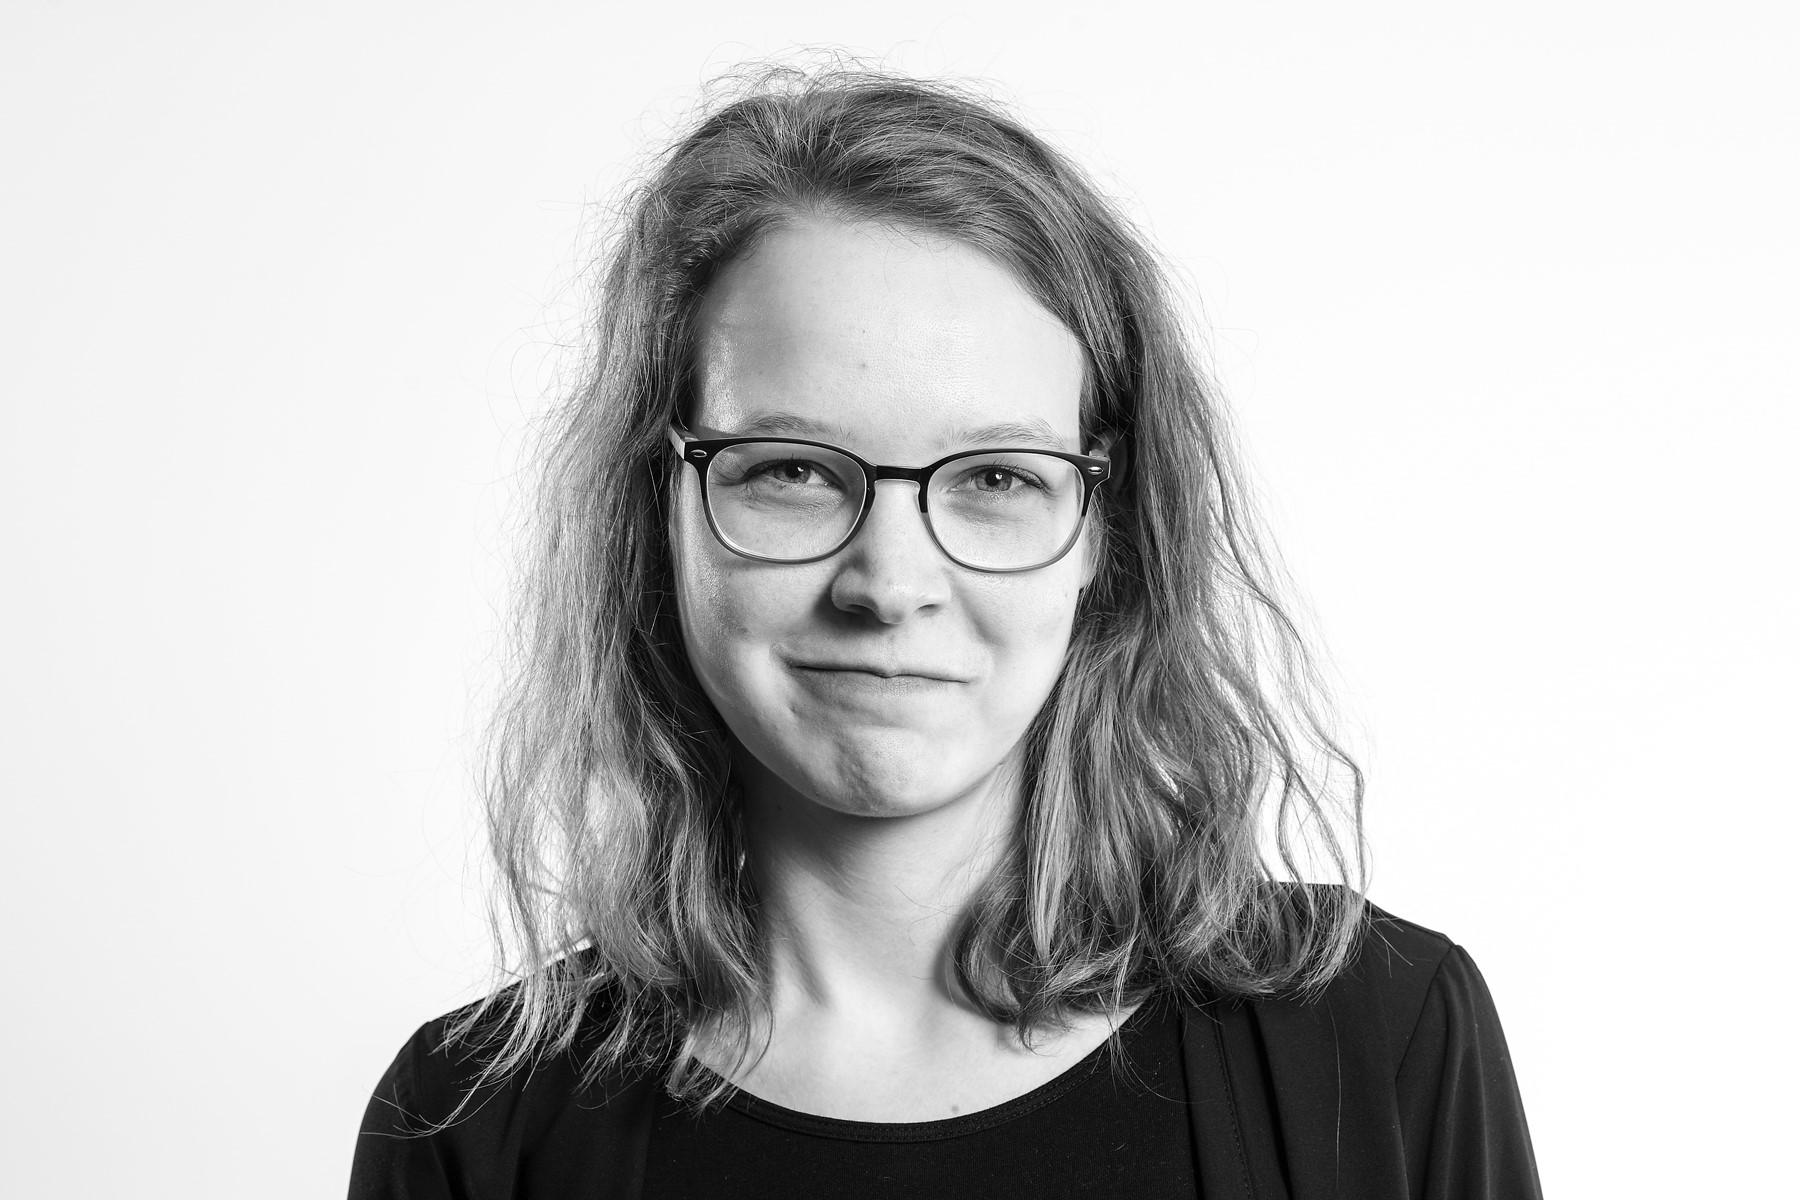 Pernilla Abildtrup